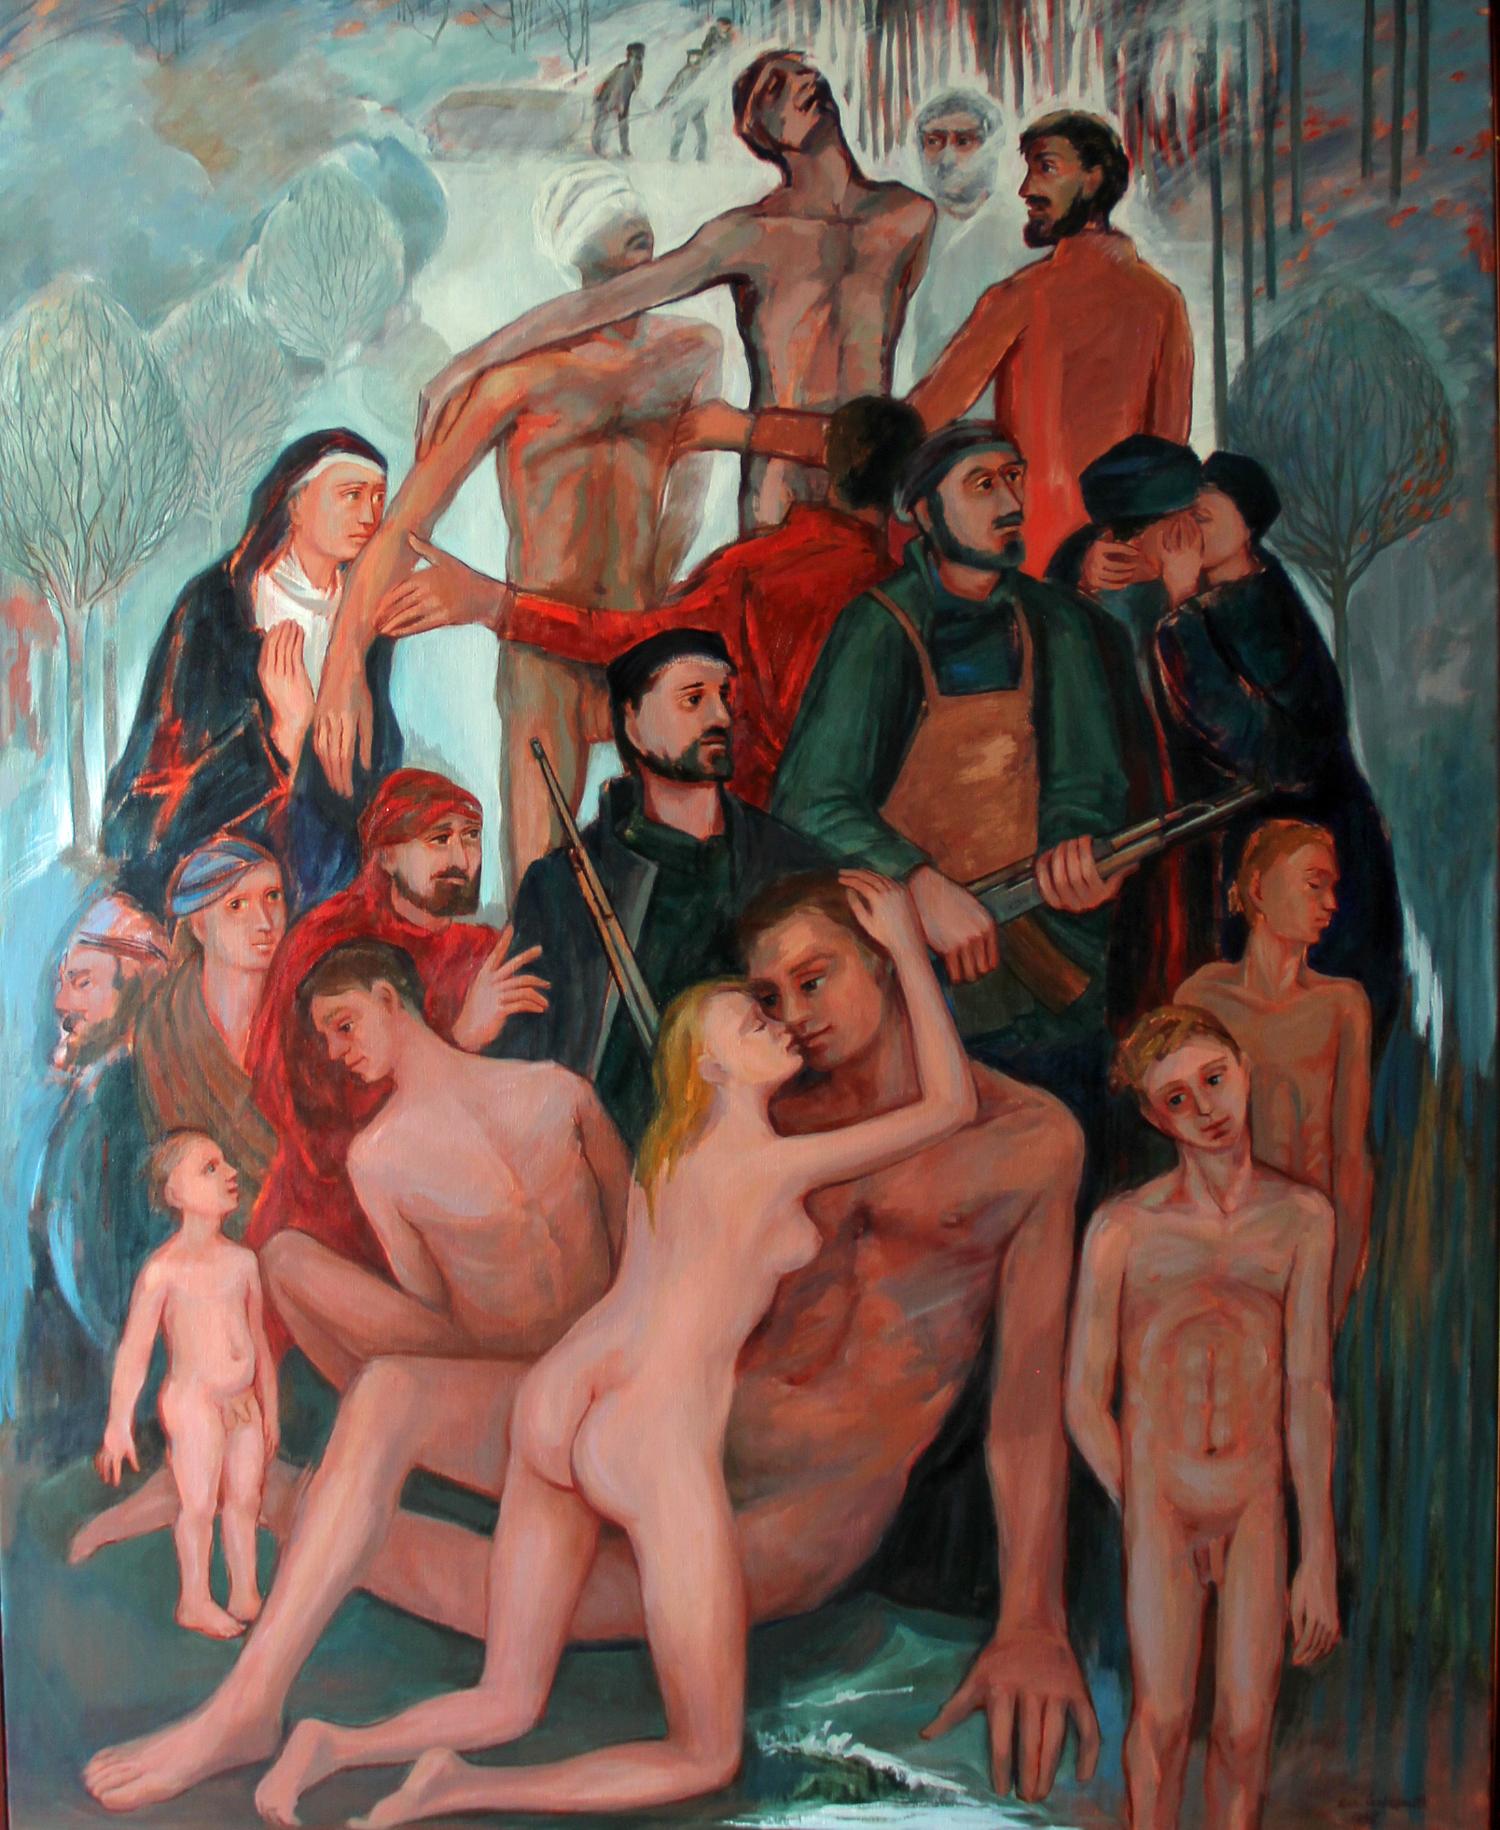 Grozny group